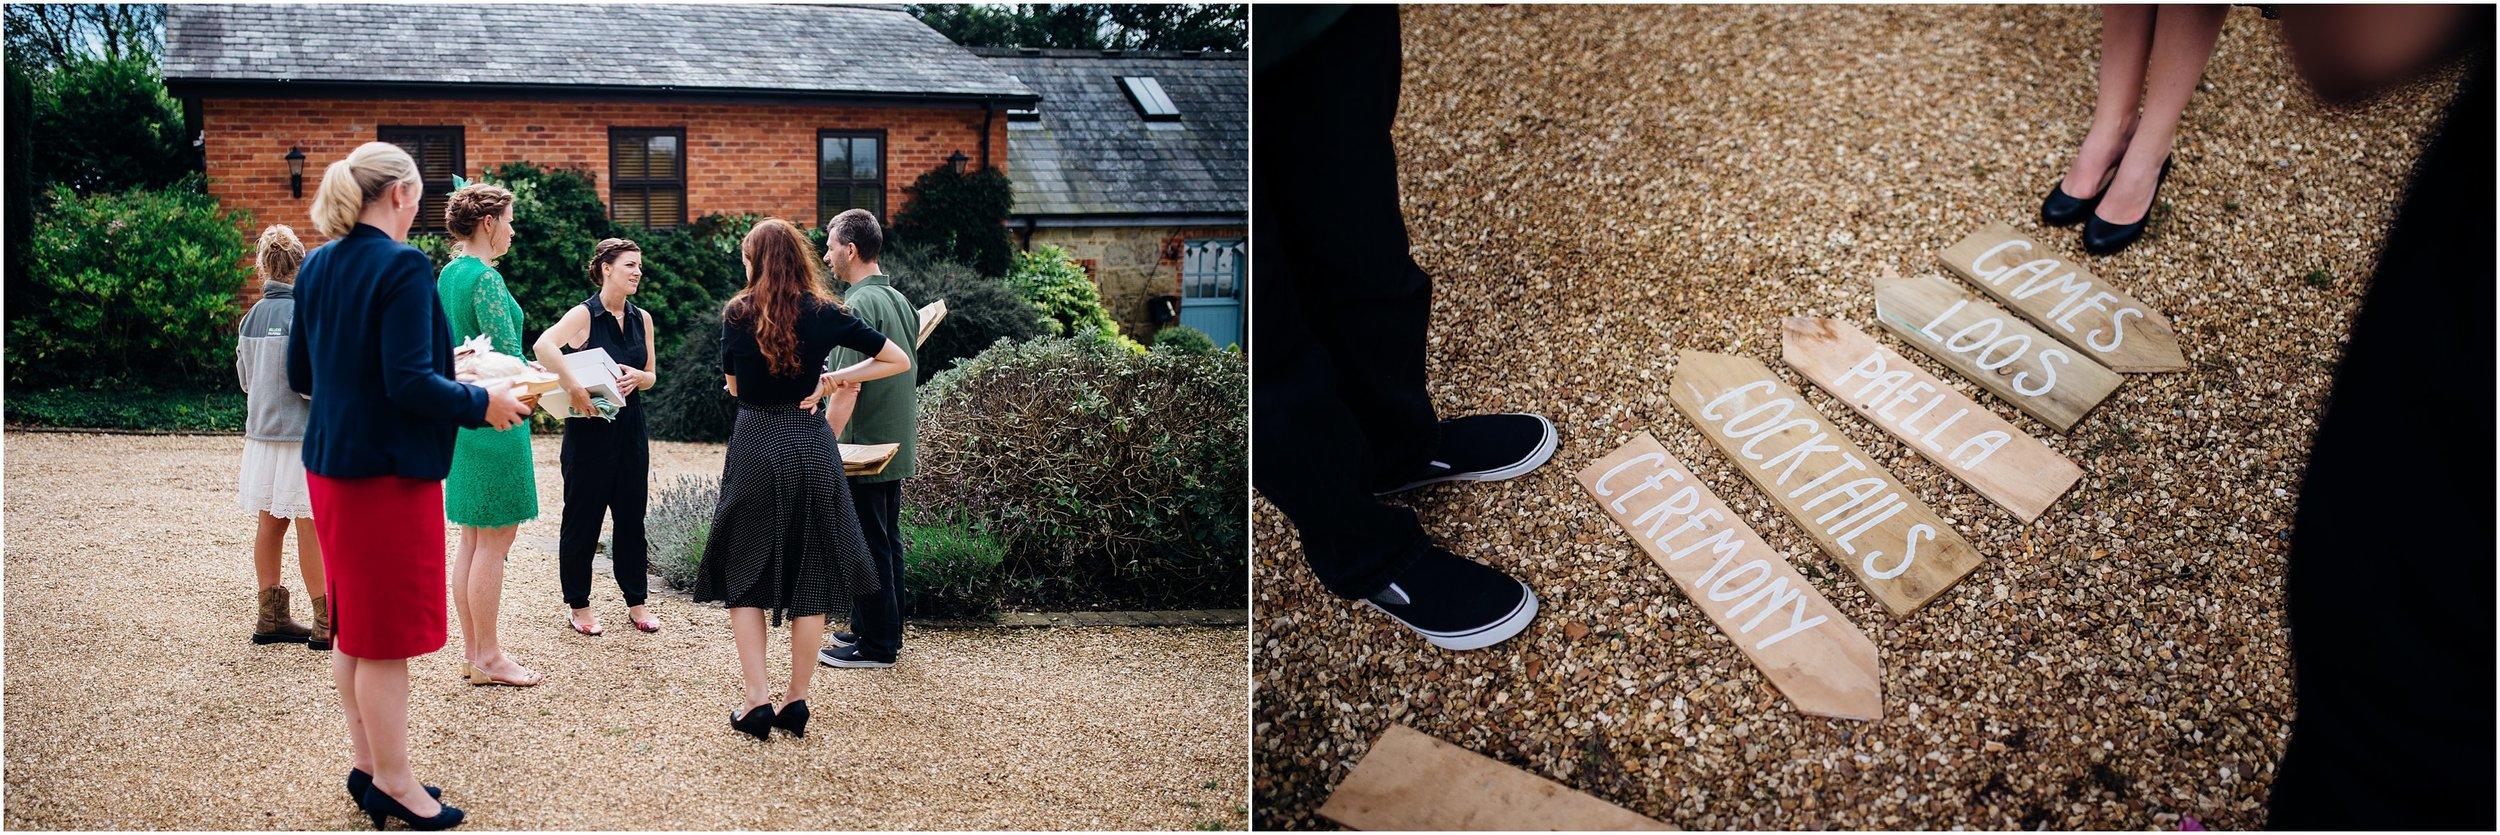 alternative outdoor garden wedding_0028.jpg